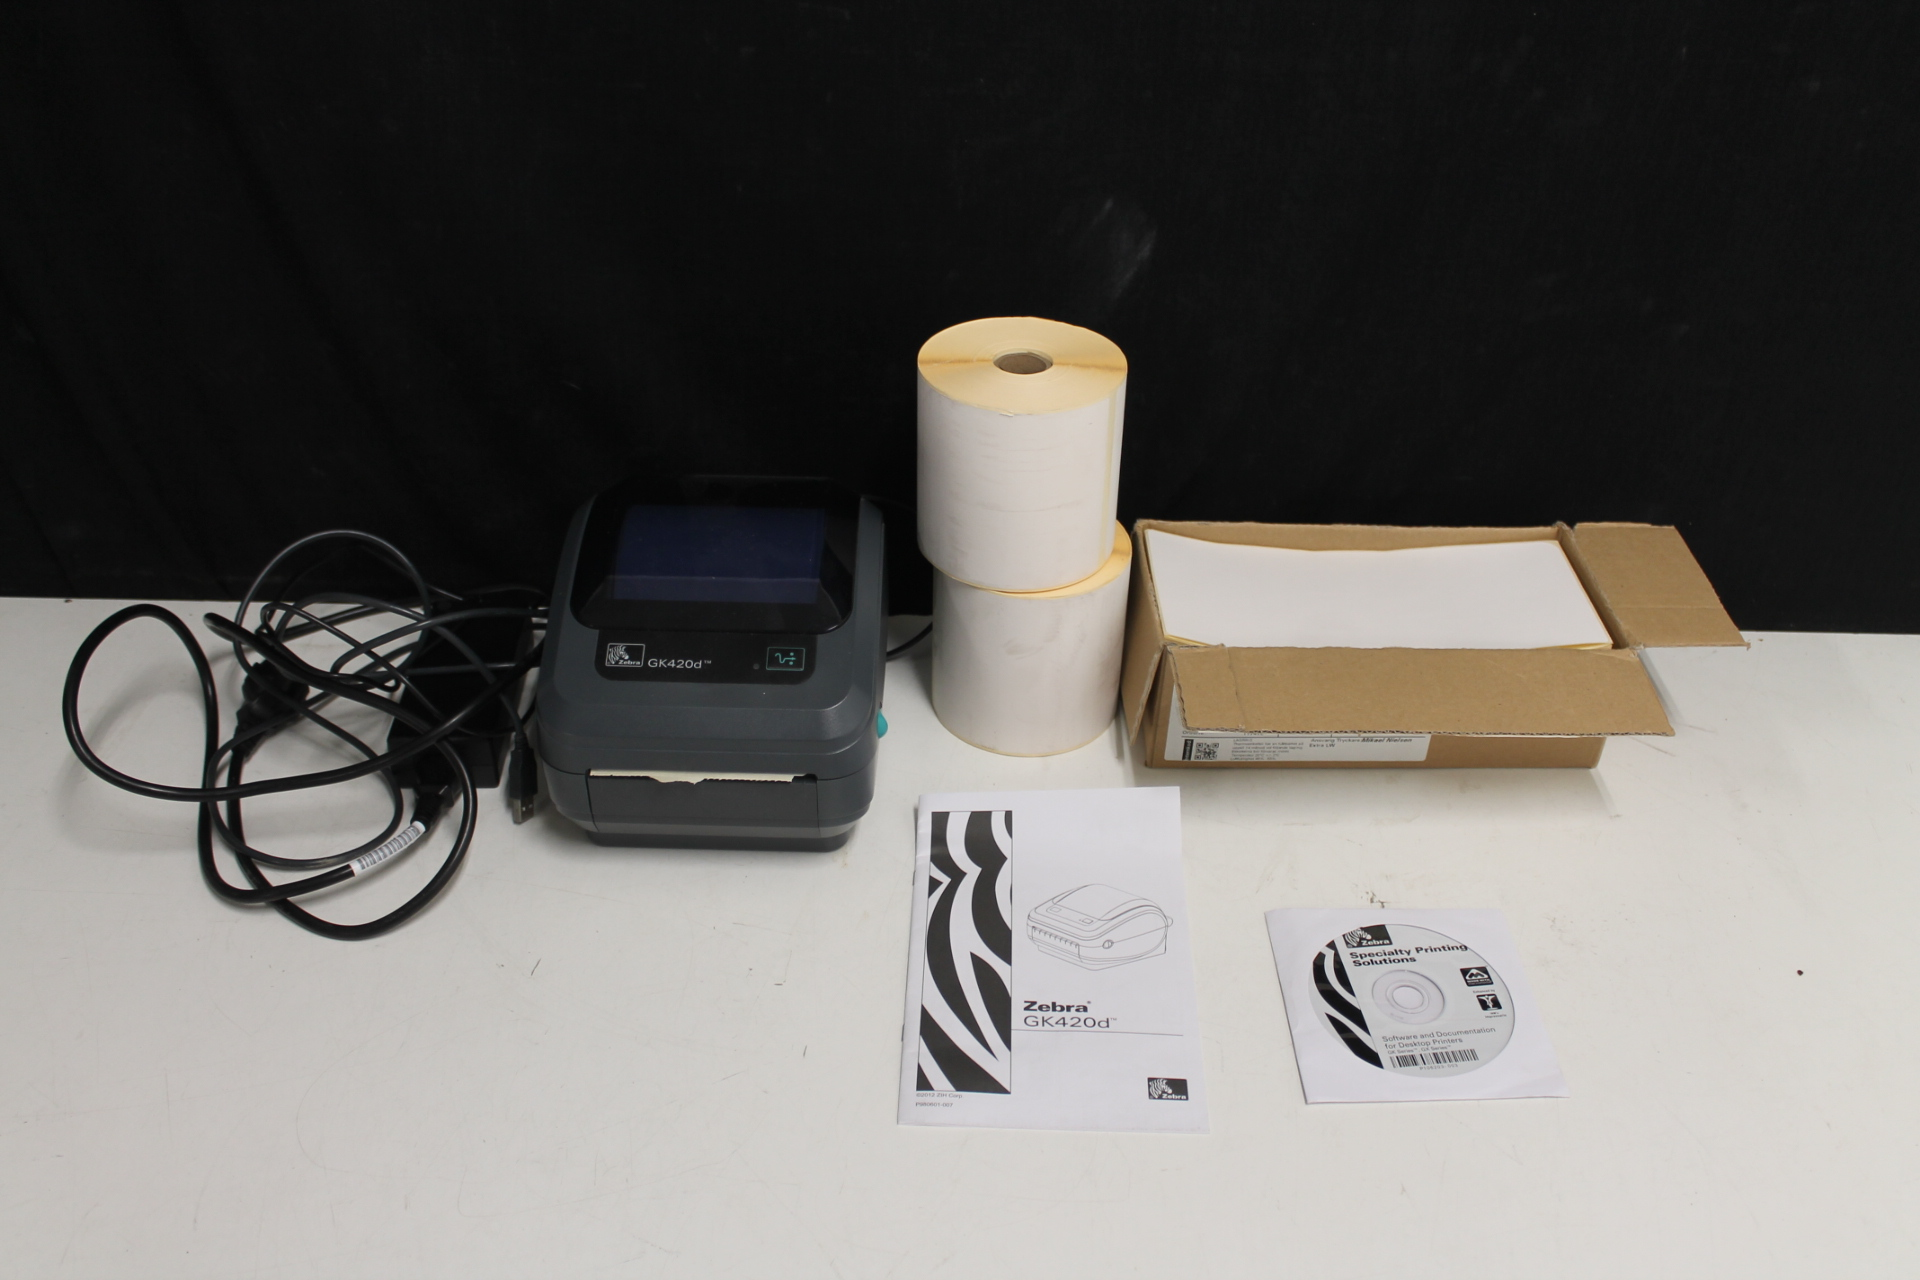 Label printer Zebra GK420d with accessories - PS Auction